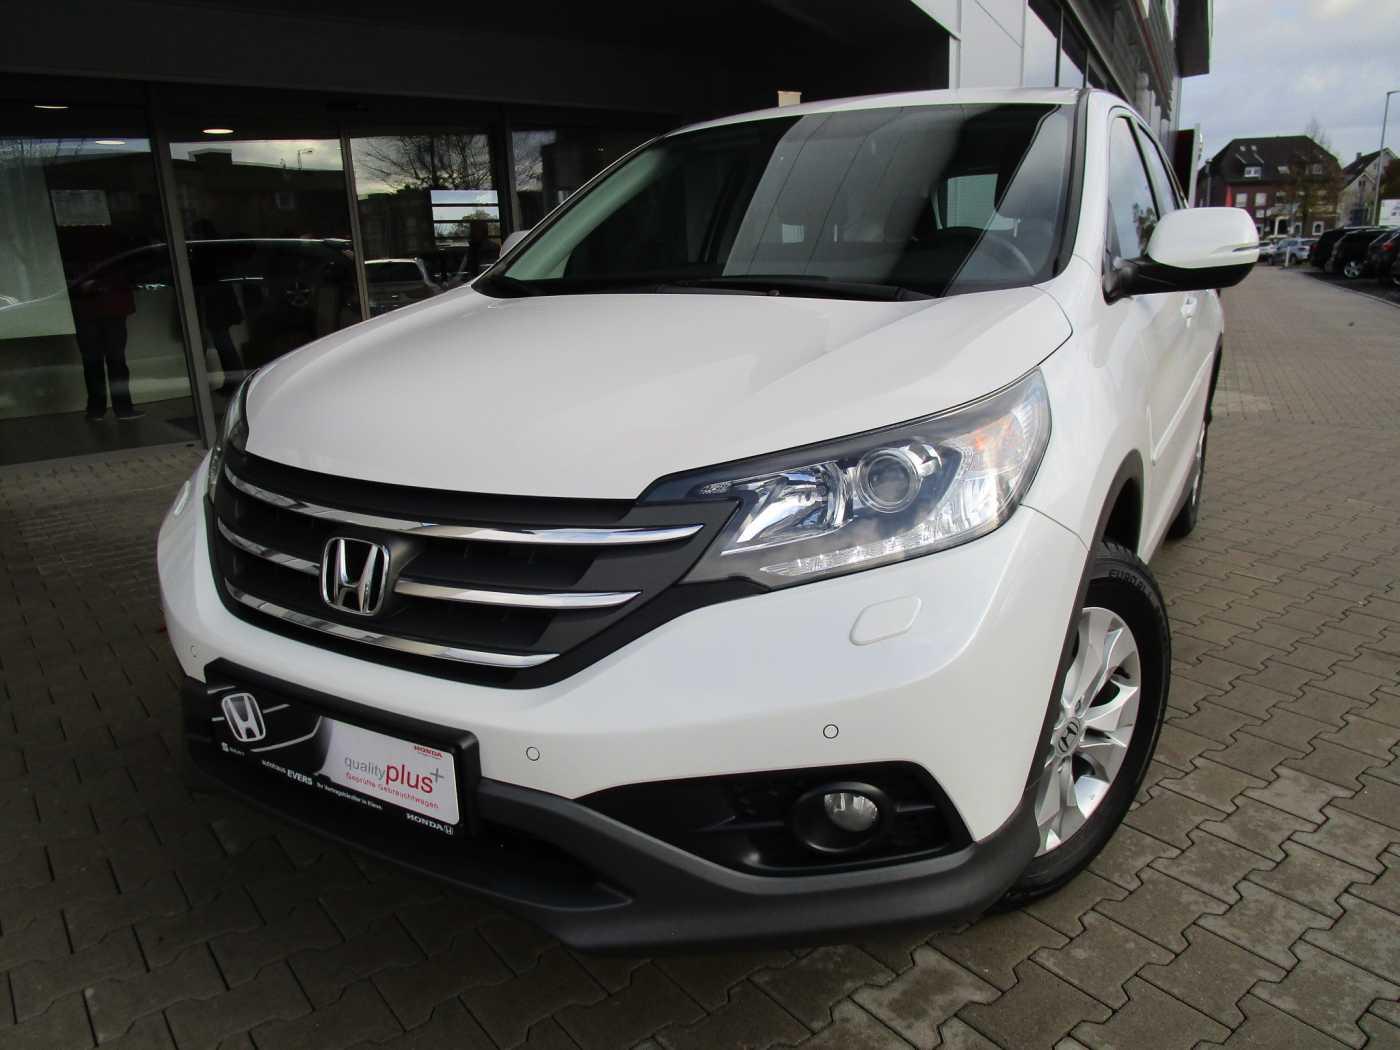 Honda CR-V 2.0i 2WD Elegance Kamera Dachspoiler 17', Jahr 2013, Benzin